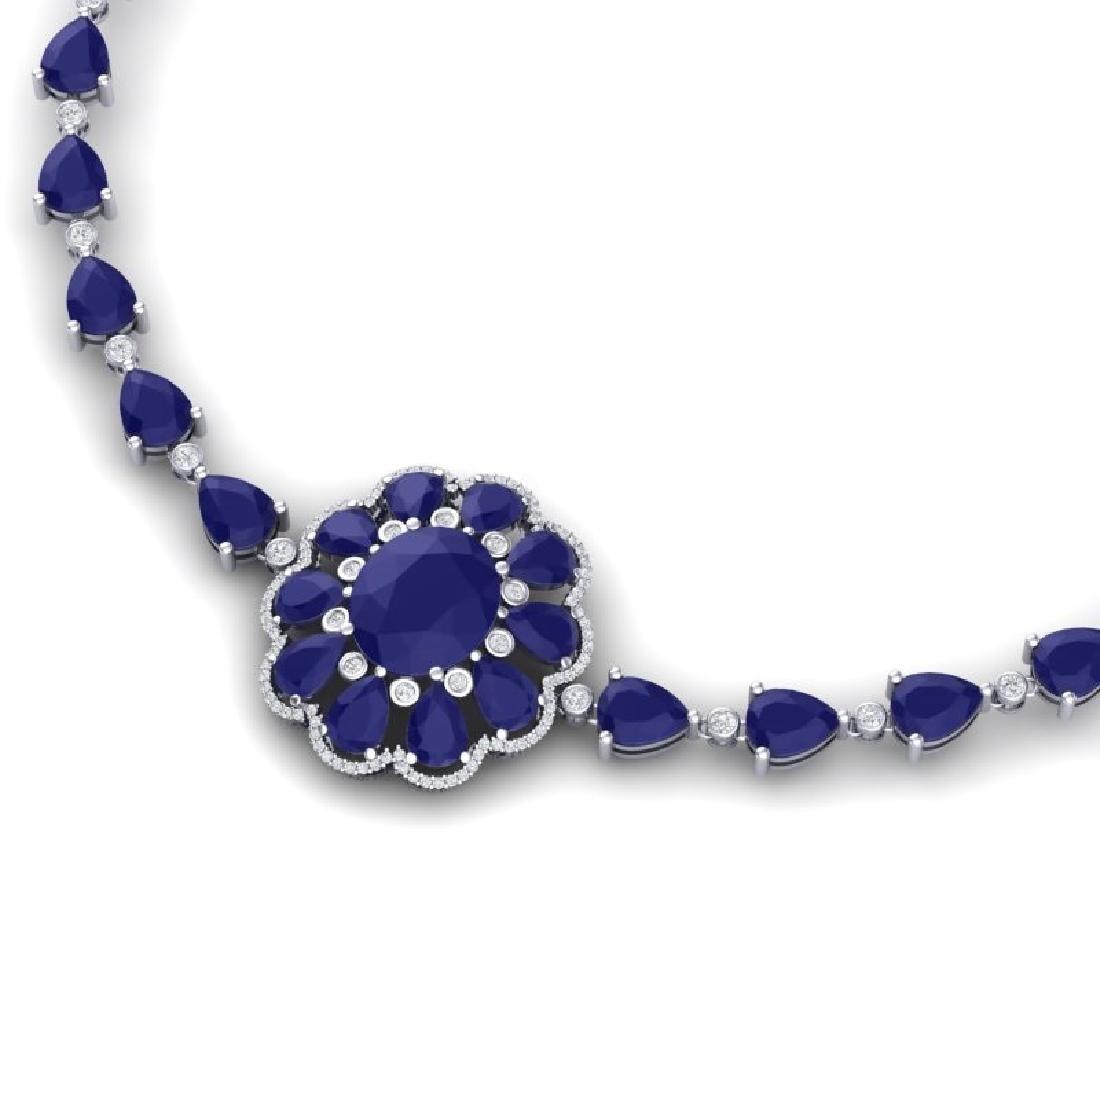 78.98 CTW Royalty Sapphire & VS Diamond Necklace 18K